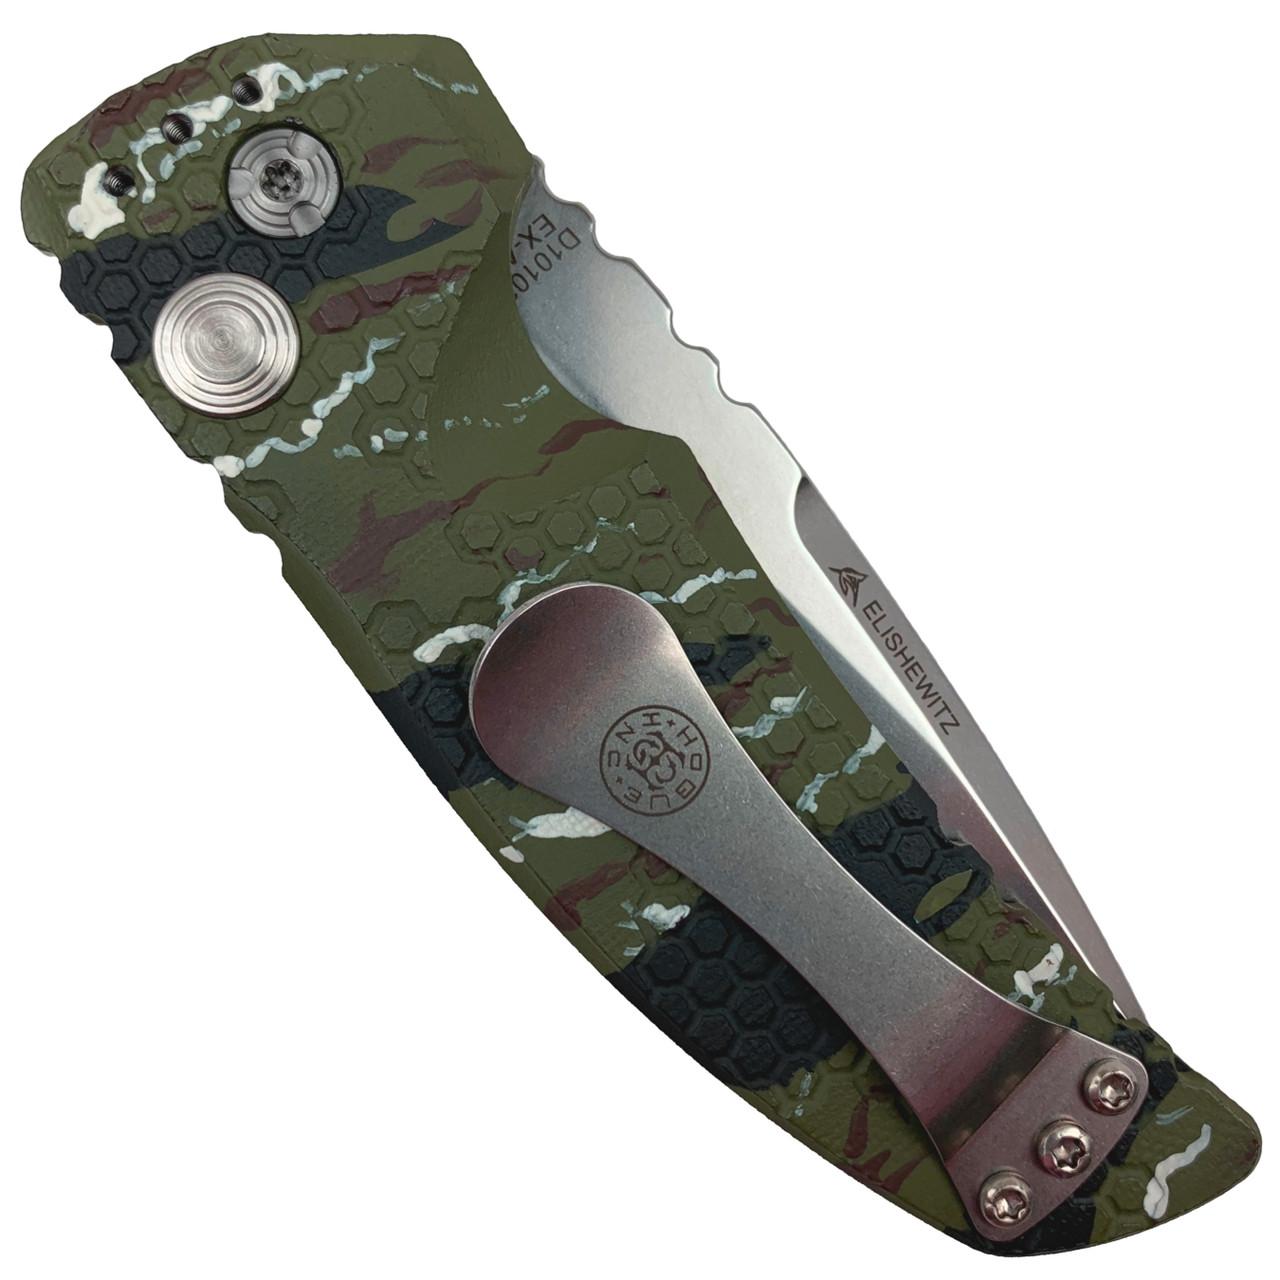 "Hogue Knives Vietnam Tiger Stripe EX-A01 3.5"" Auto Knife, Tumbled Blade REAR VIEW"